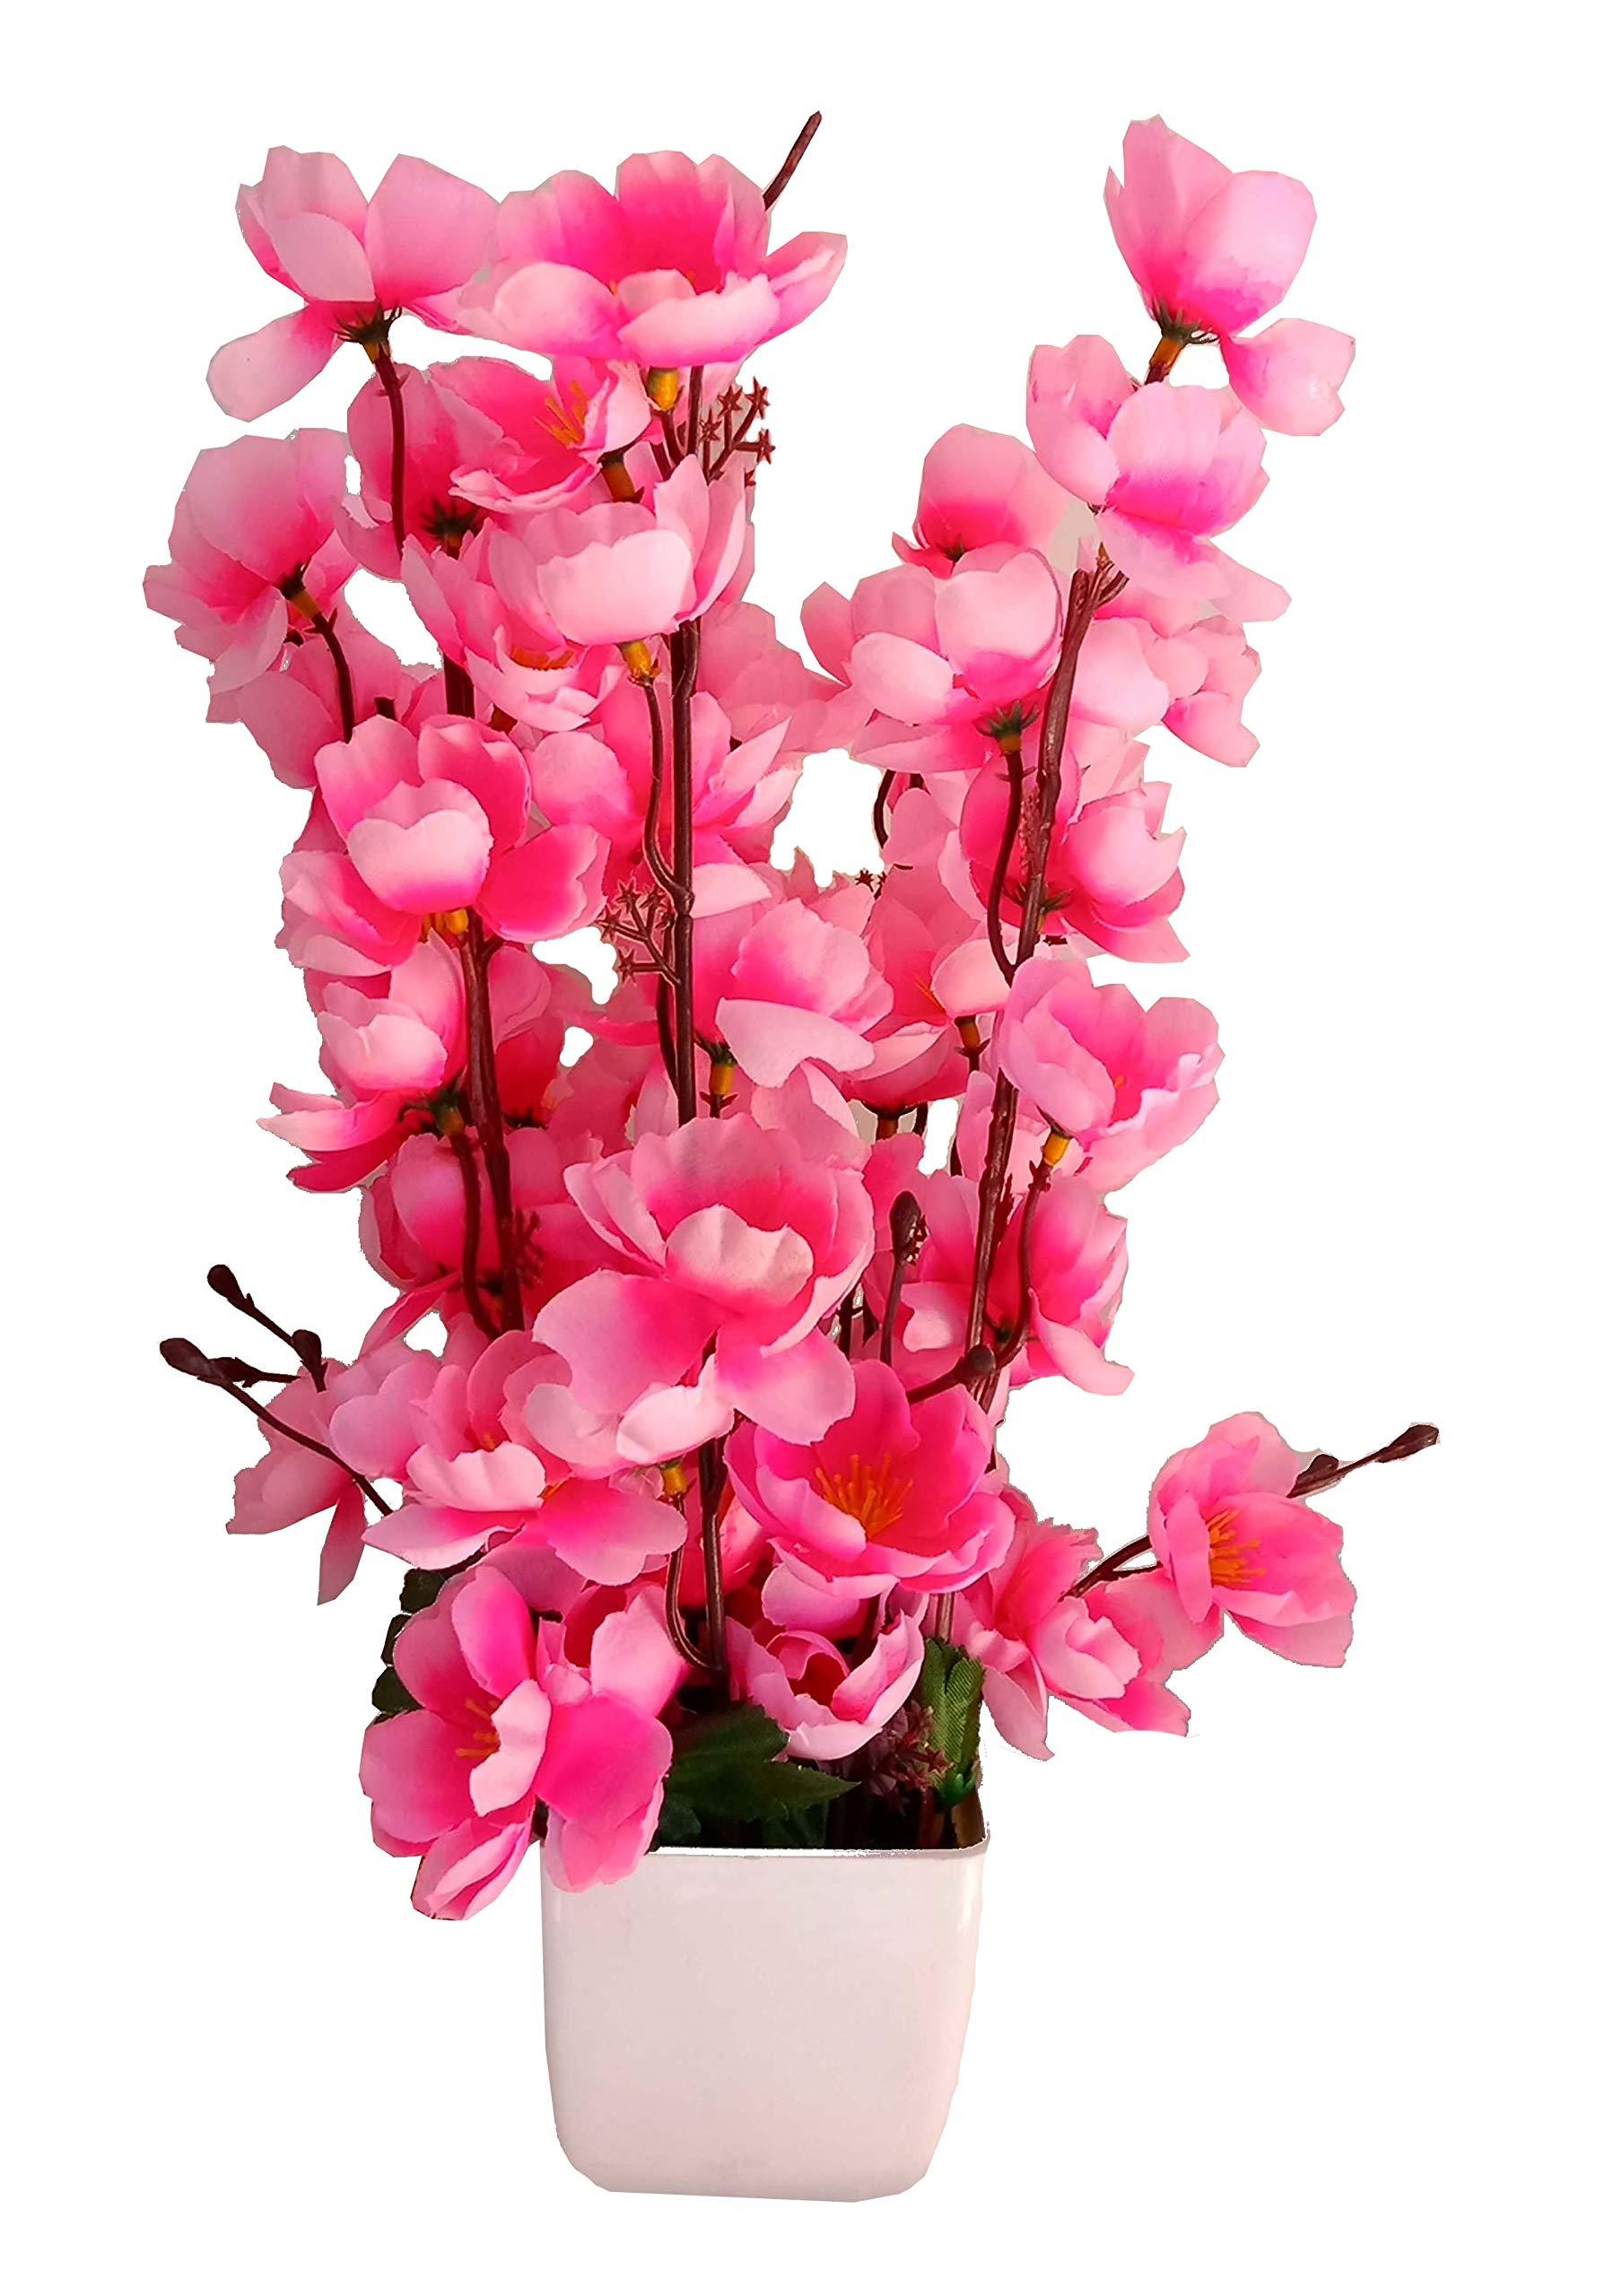 Hyperboles Artificial Pink Flower Home Decorative Orchid Blossom Flower Vase Pvc Plastic Wooden Pot 12inch 30cm Pink Buy Online In Grenada At Grenada Desertcart Com Productid 124284312